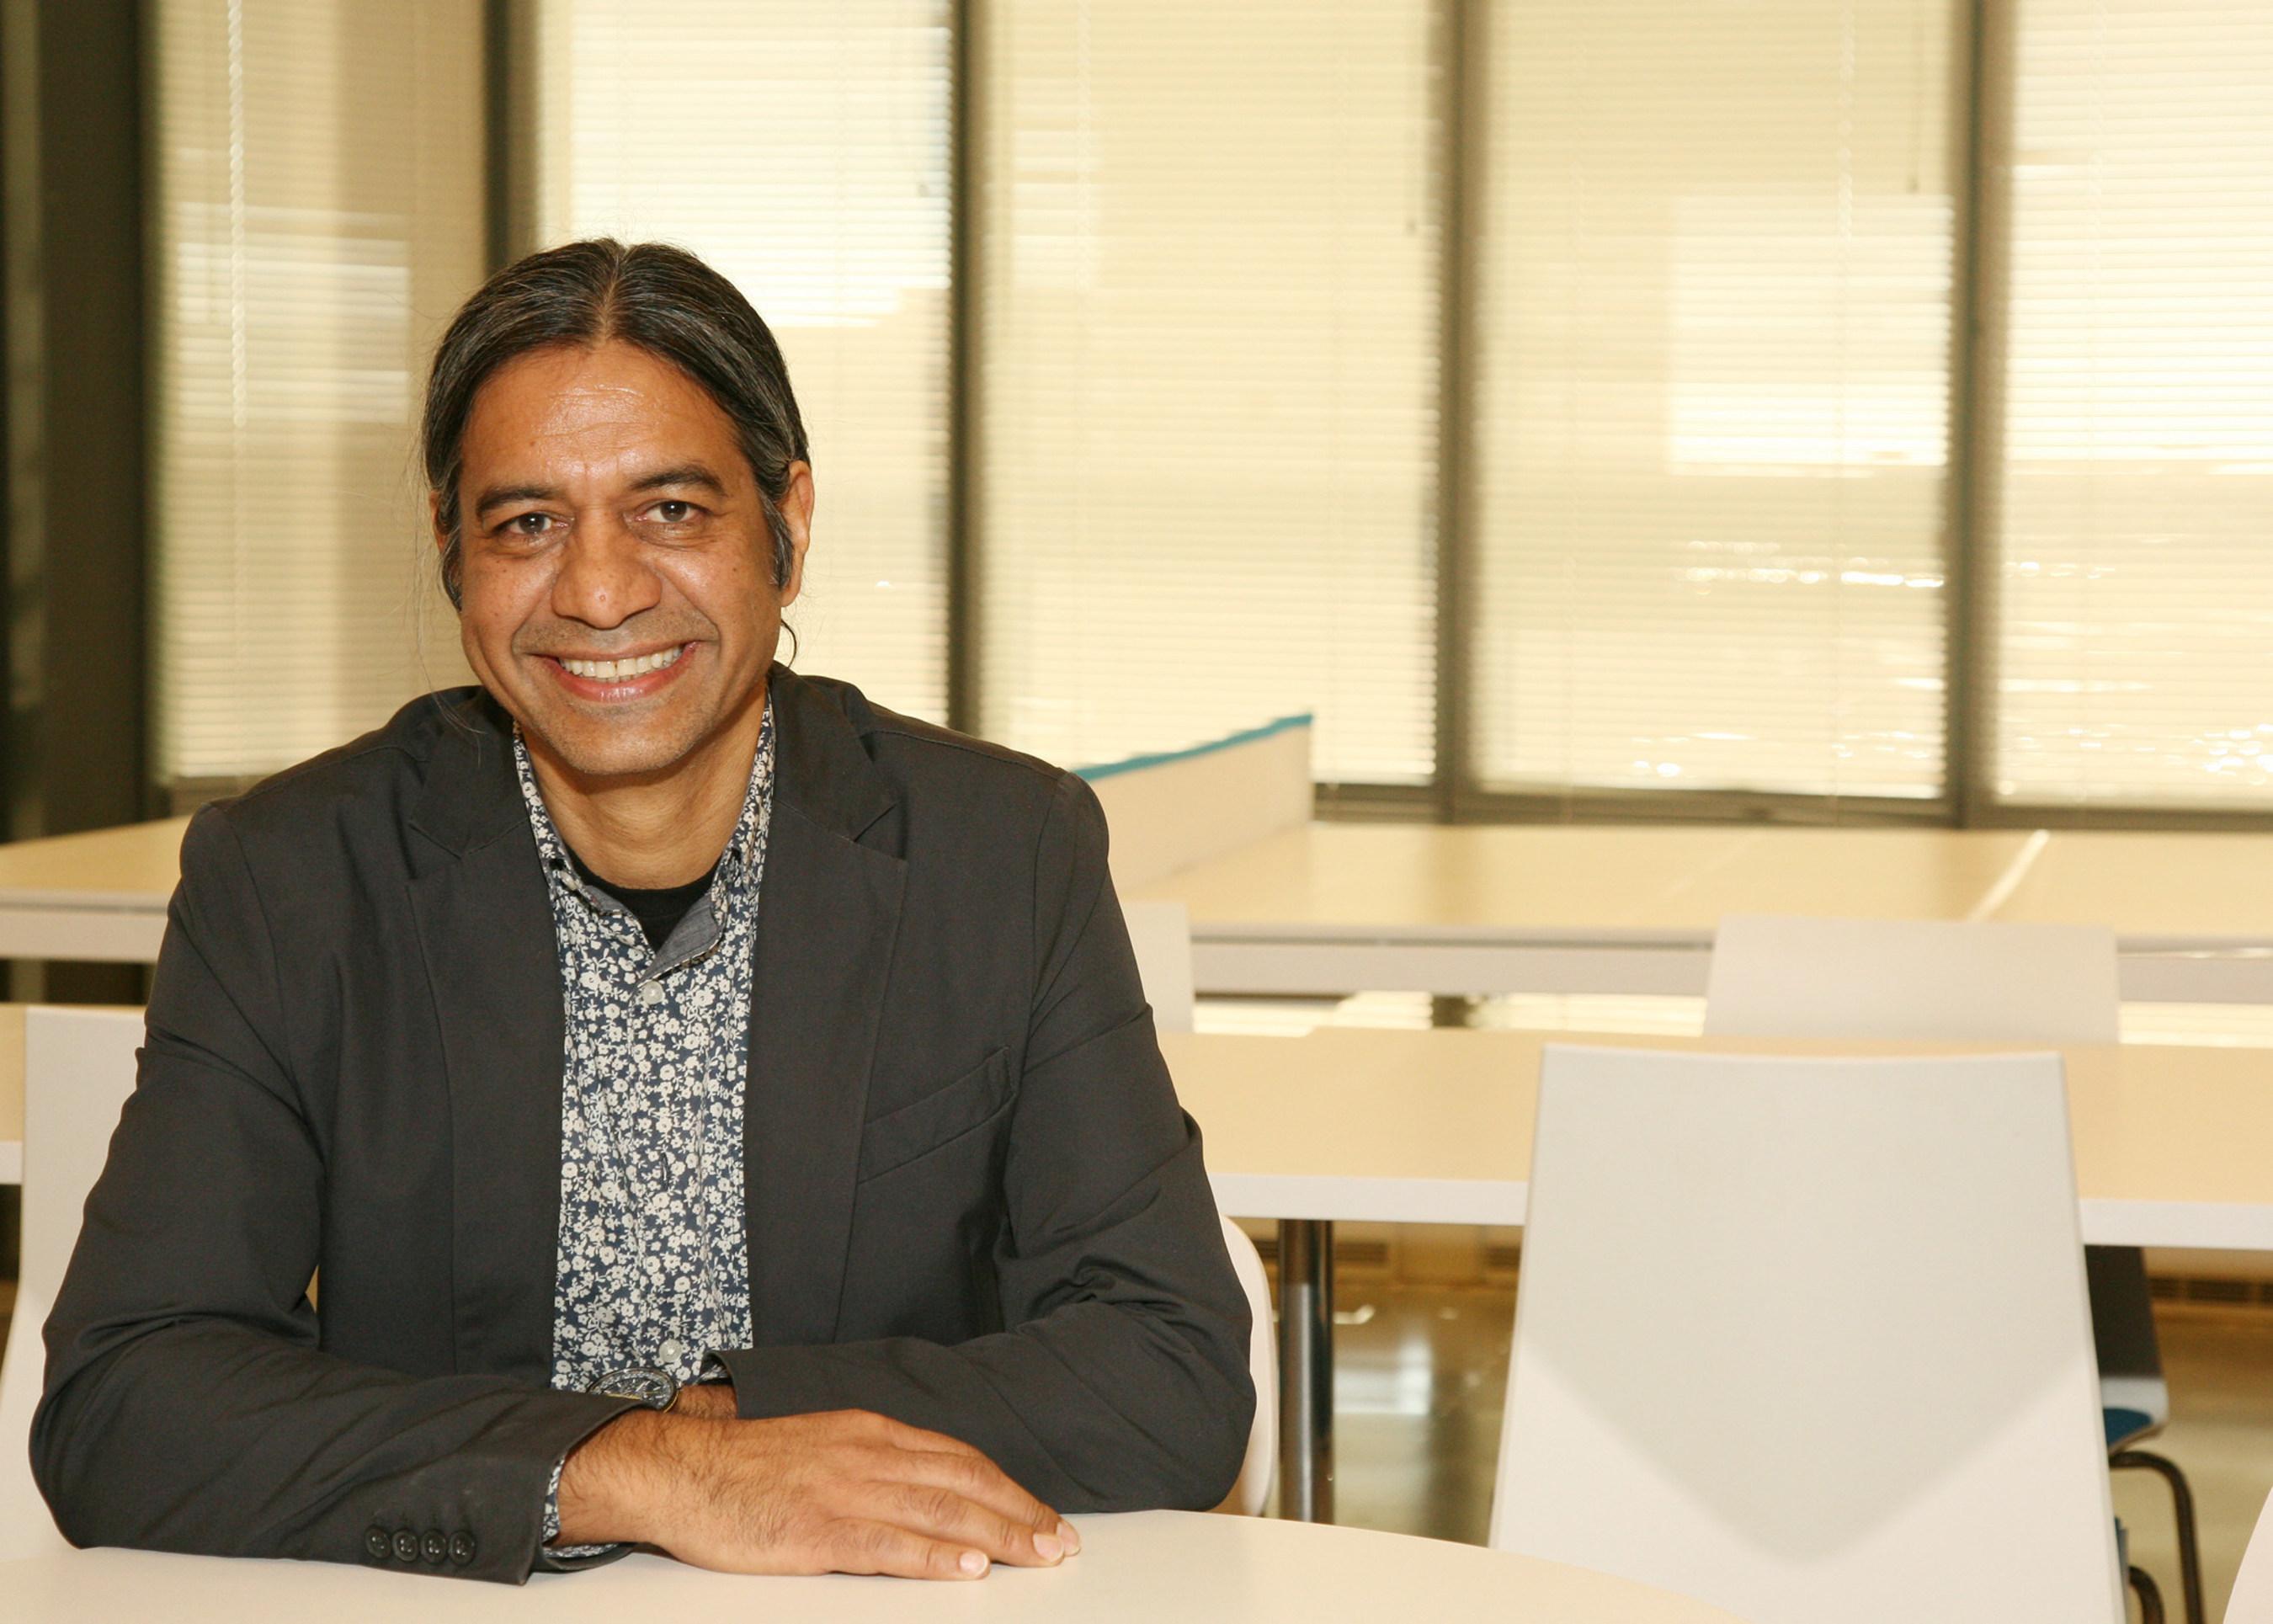 Tech veteran Hugh Khan joins Lockton as Senior Vice President